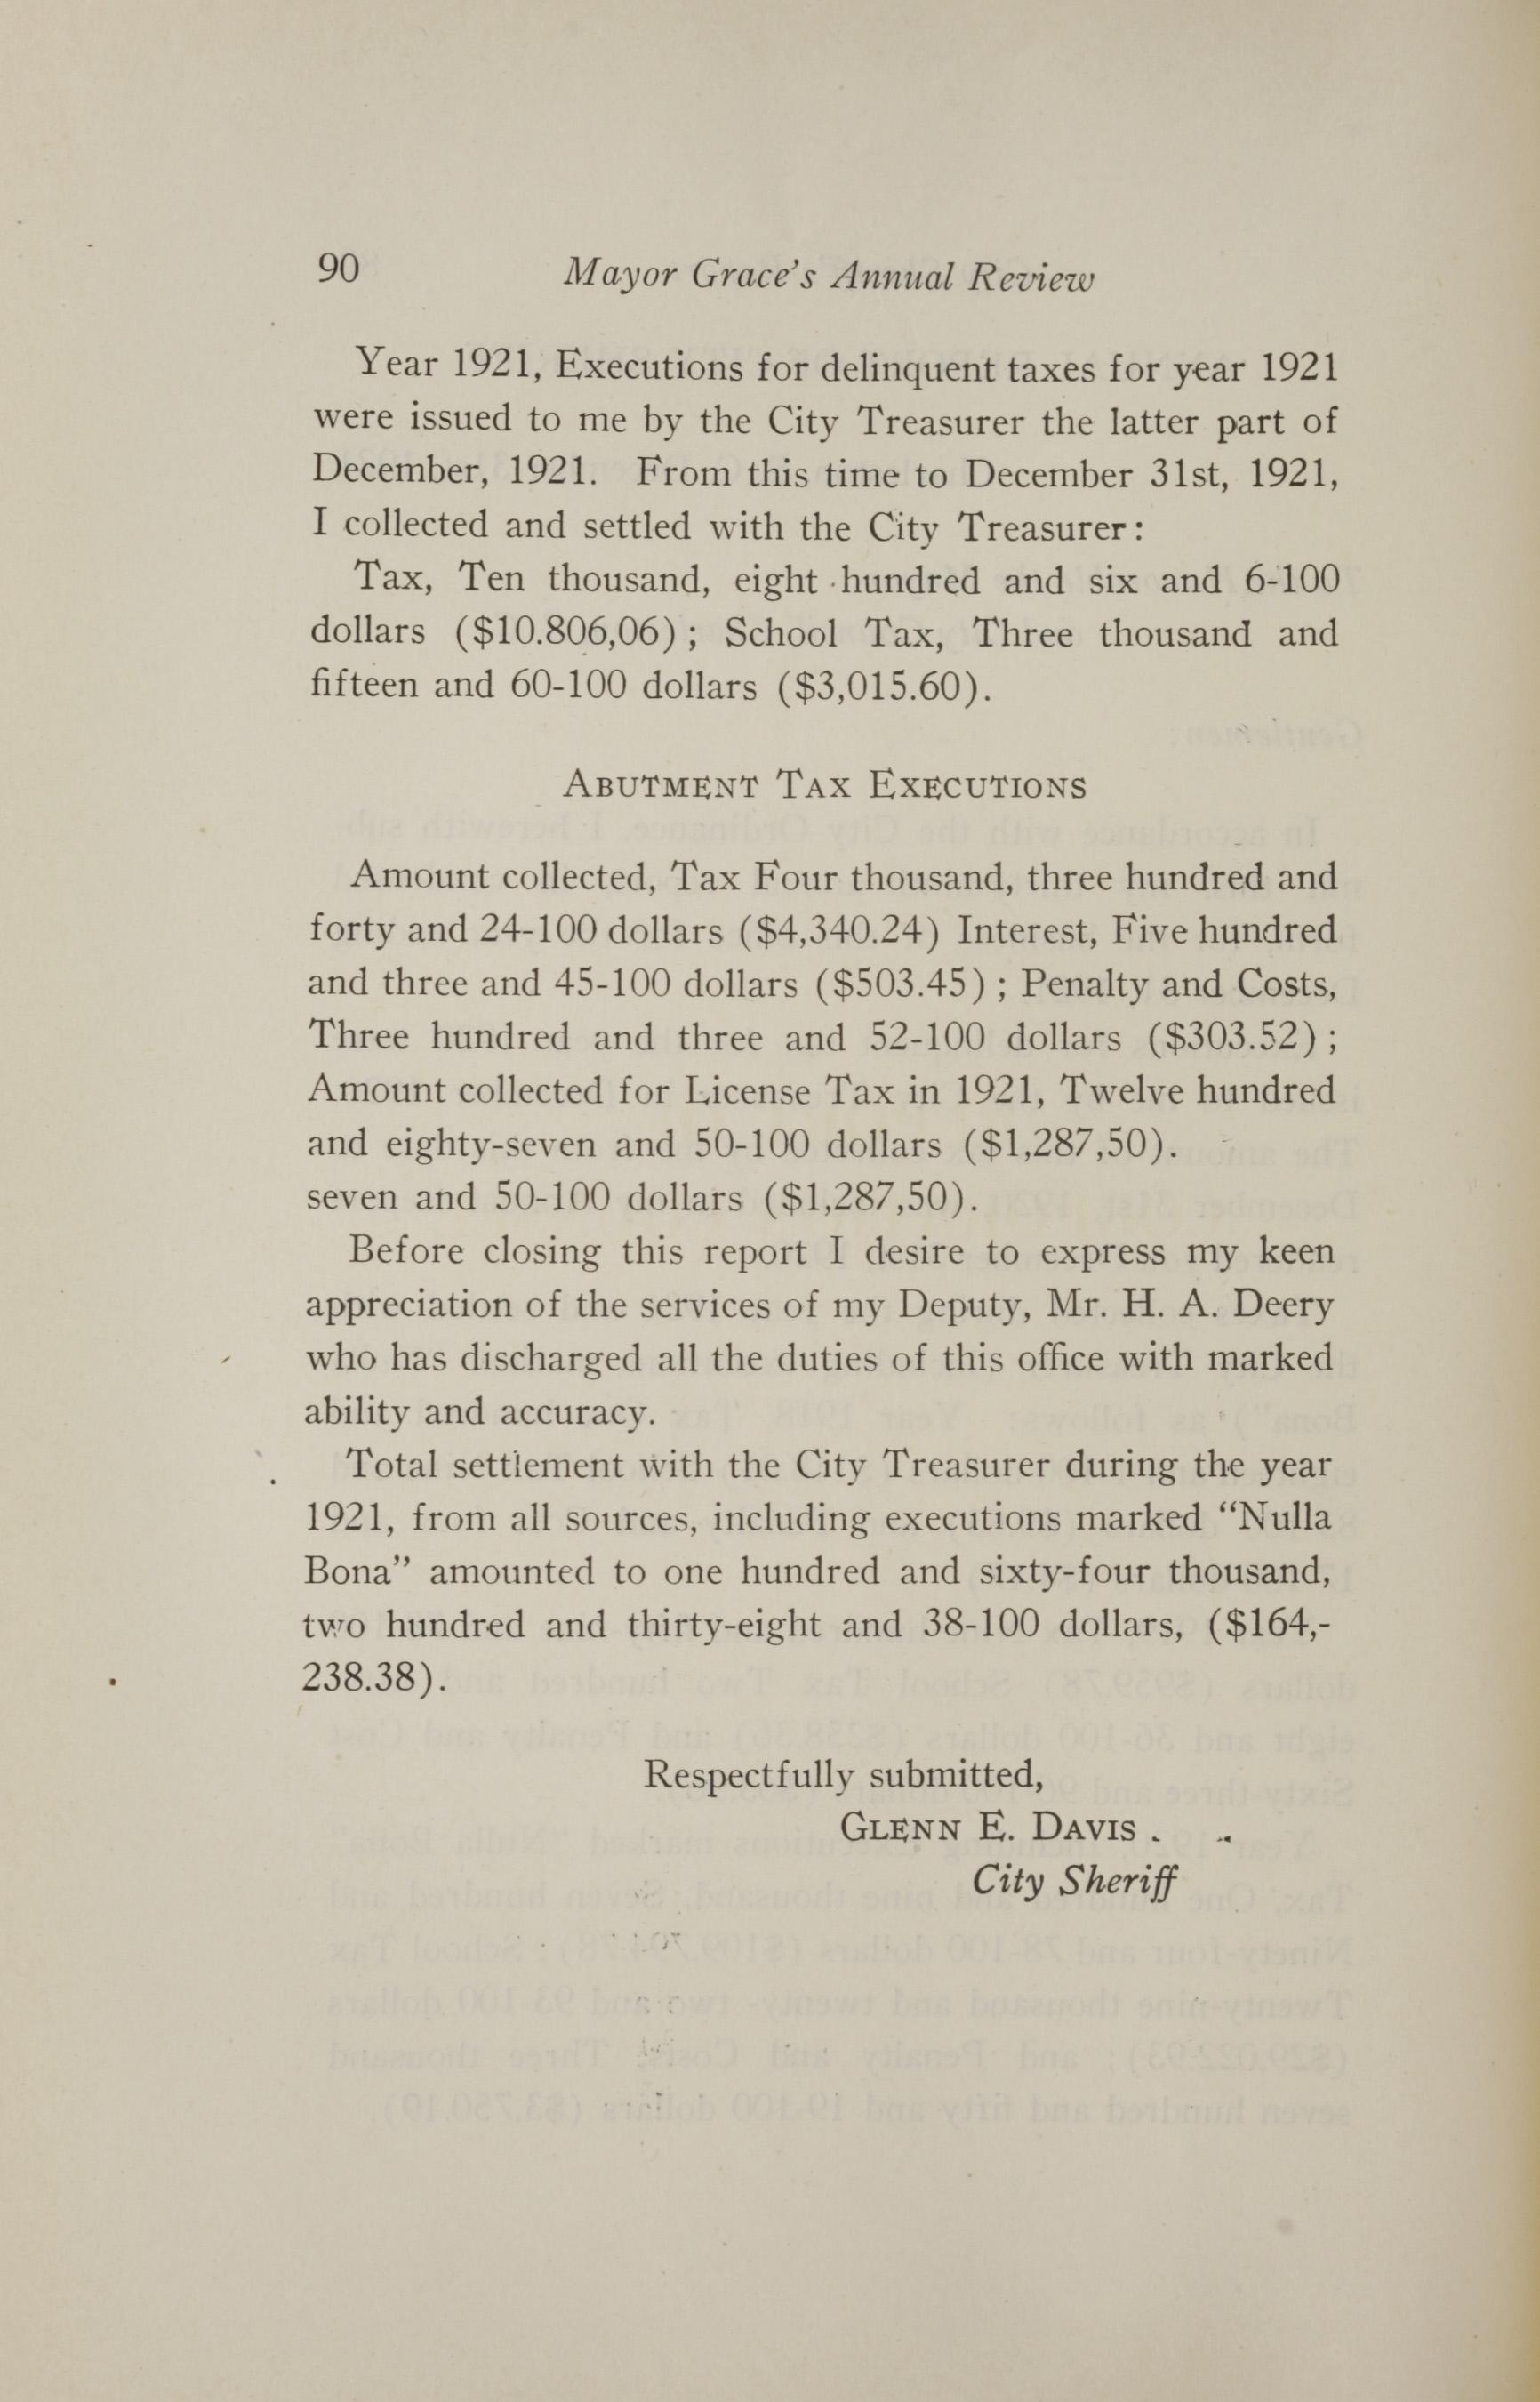 Charleston Yearbook, 1921, page 90